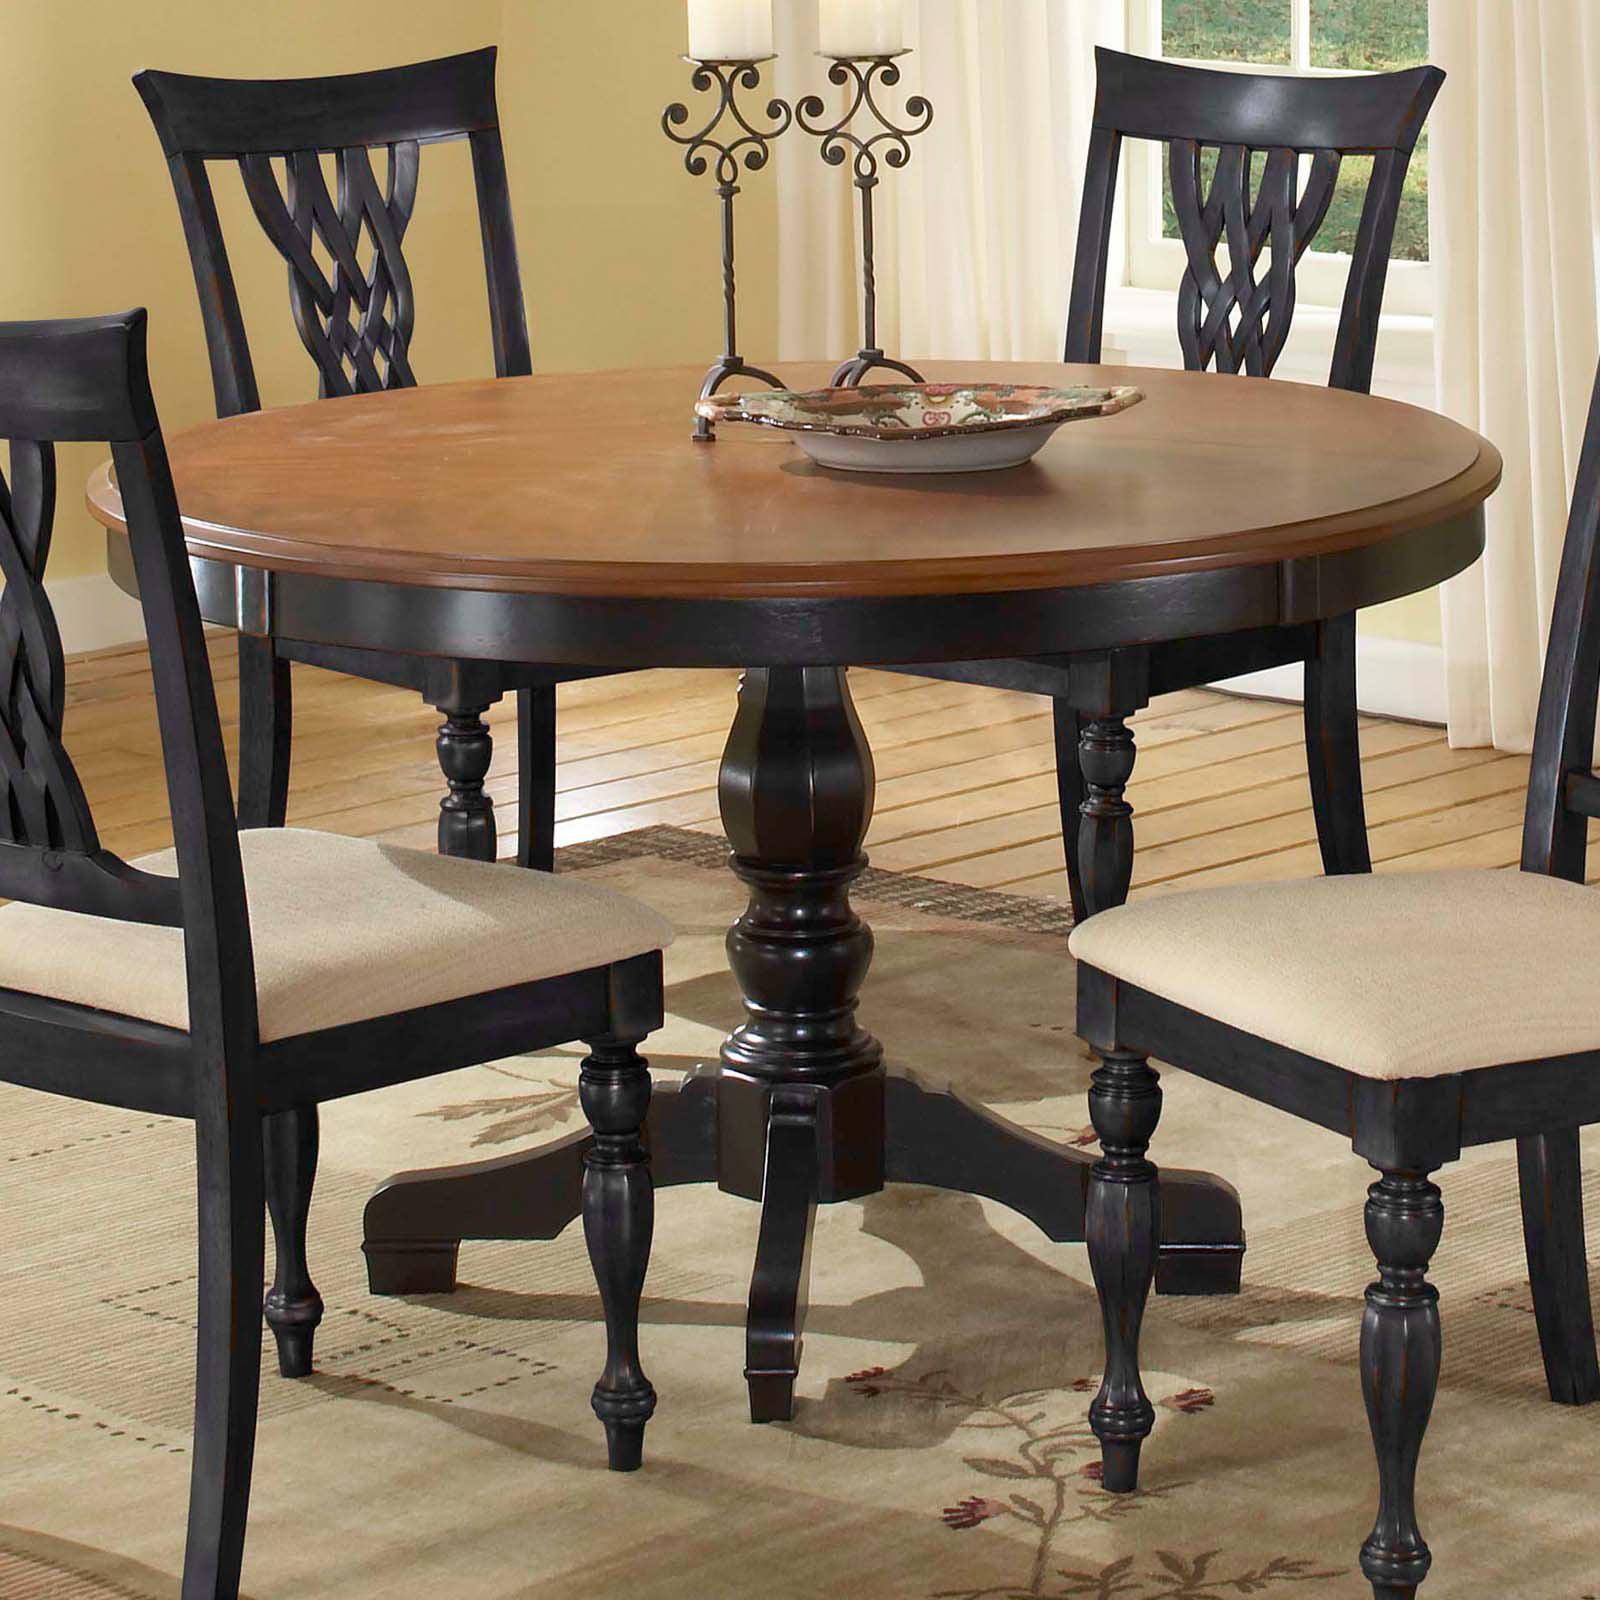 Hillsdale Embassy Round Pedestal Table With 48 Inch Pattern Veneer Wood Top Cherry Amp Black Walmart Com Walmart Com